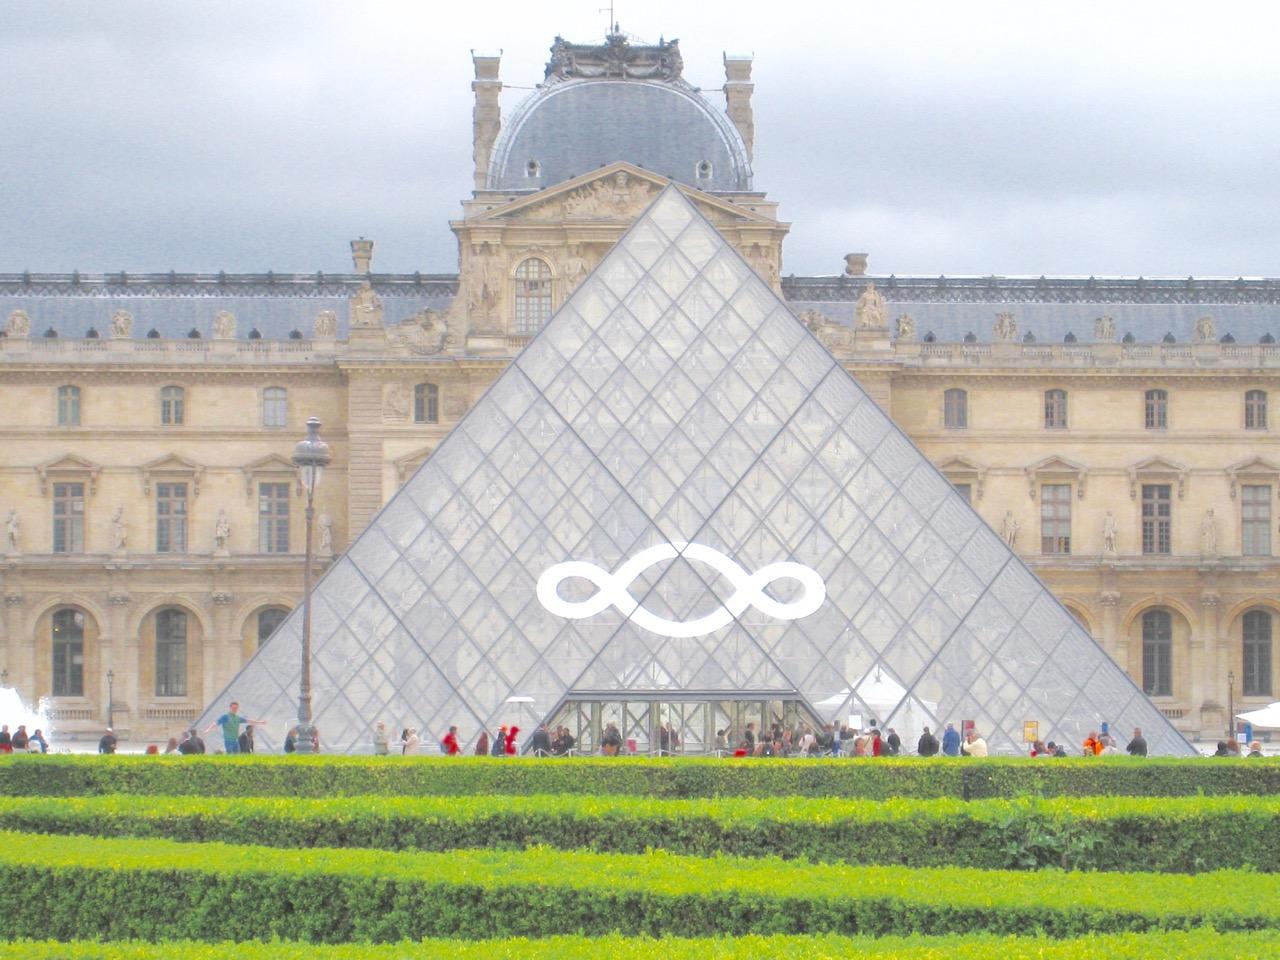 I.M.Pei's Pyramid